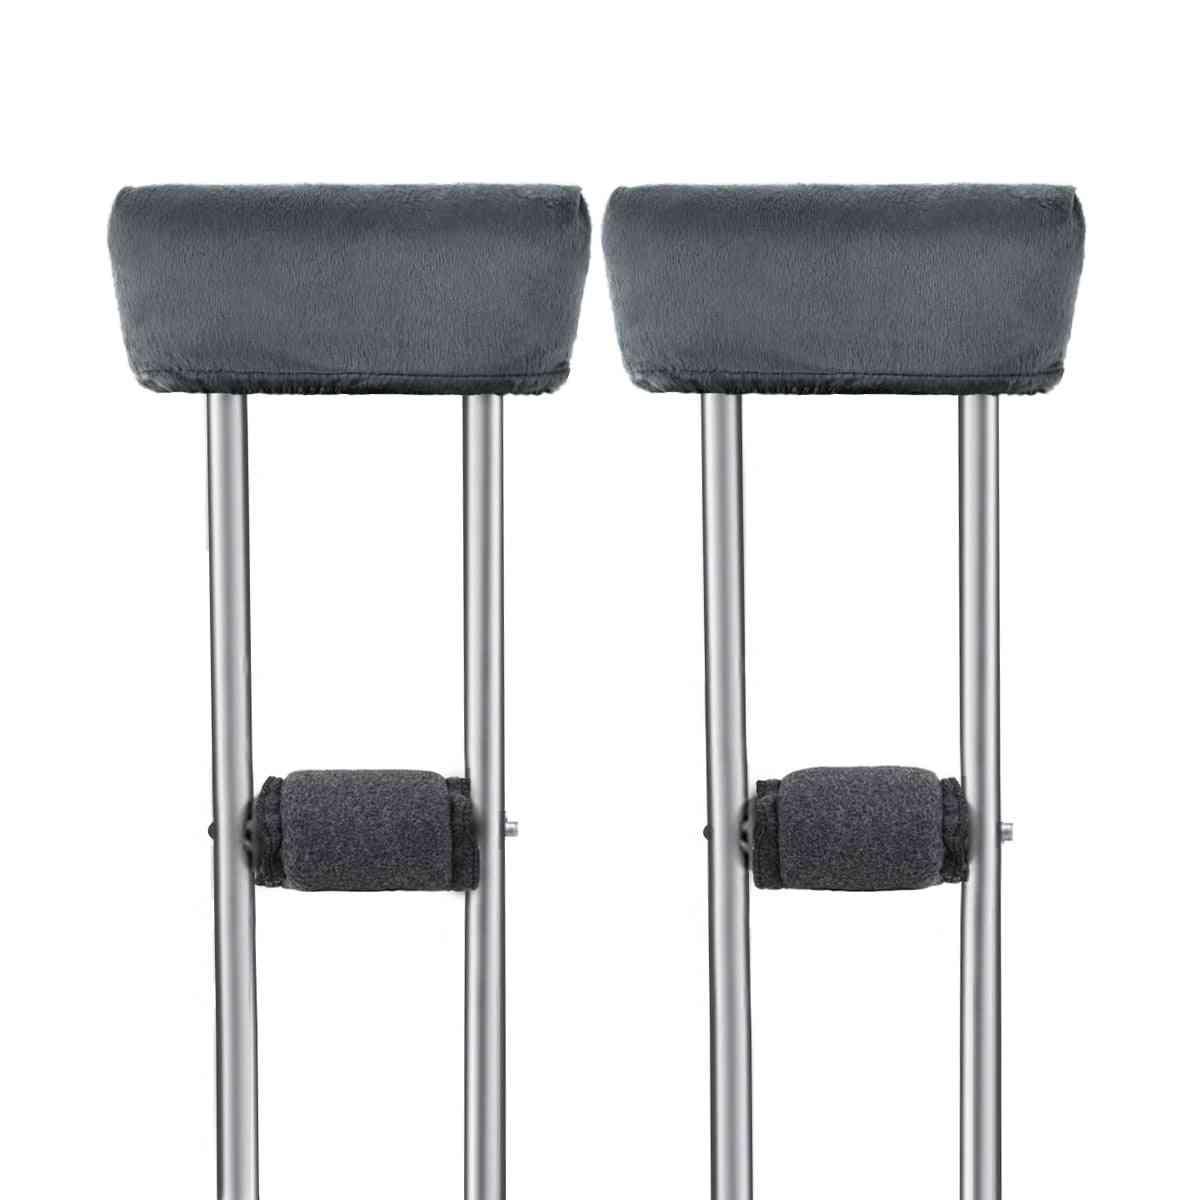 Universal Crutch Pads-underarm And Hand Grip Padding